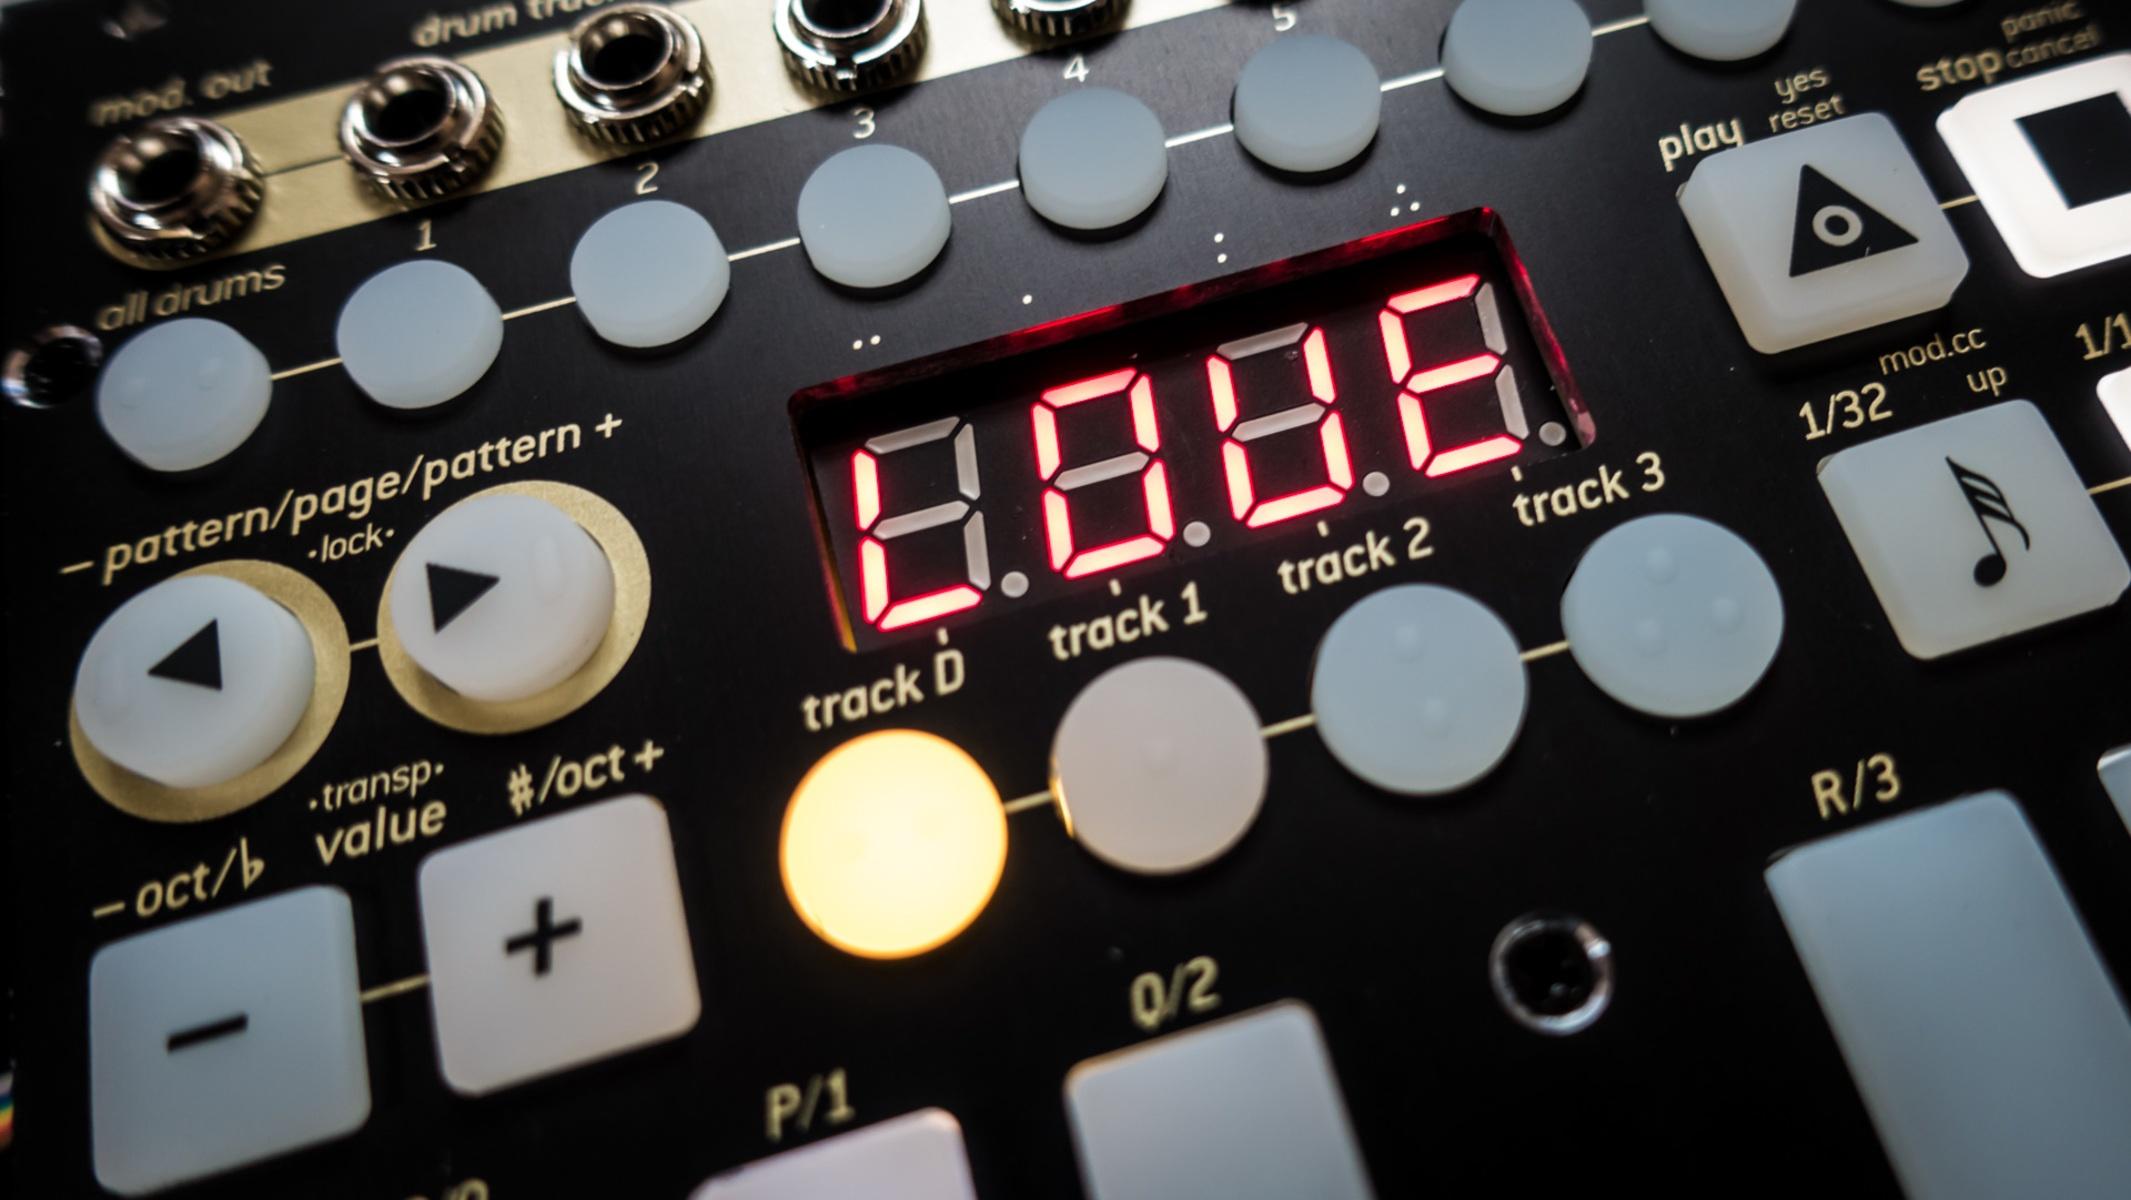 zenman_music's music gear photo containing Endorphin.es Ground Control